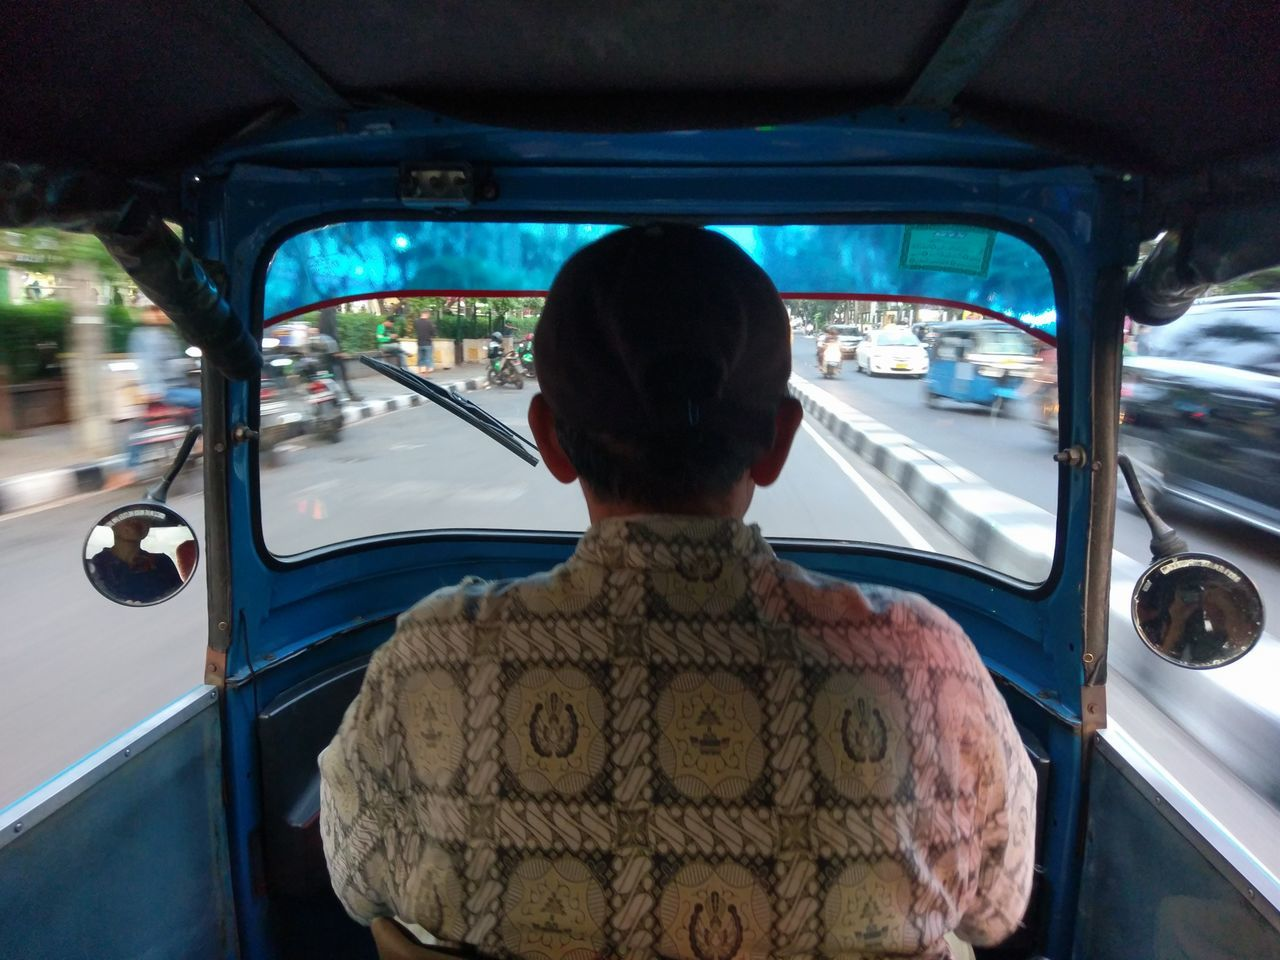 Bajaj ride Driving Man Land Vehicle Bajaj Ride Journey Outdoors Jakarta Indonesia Transportation